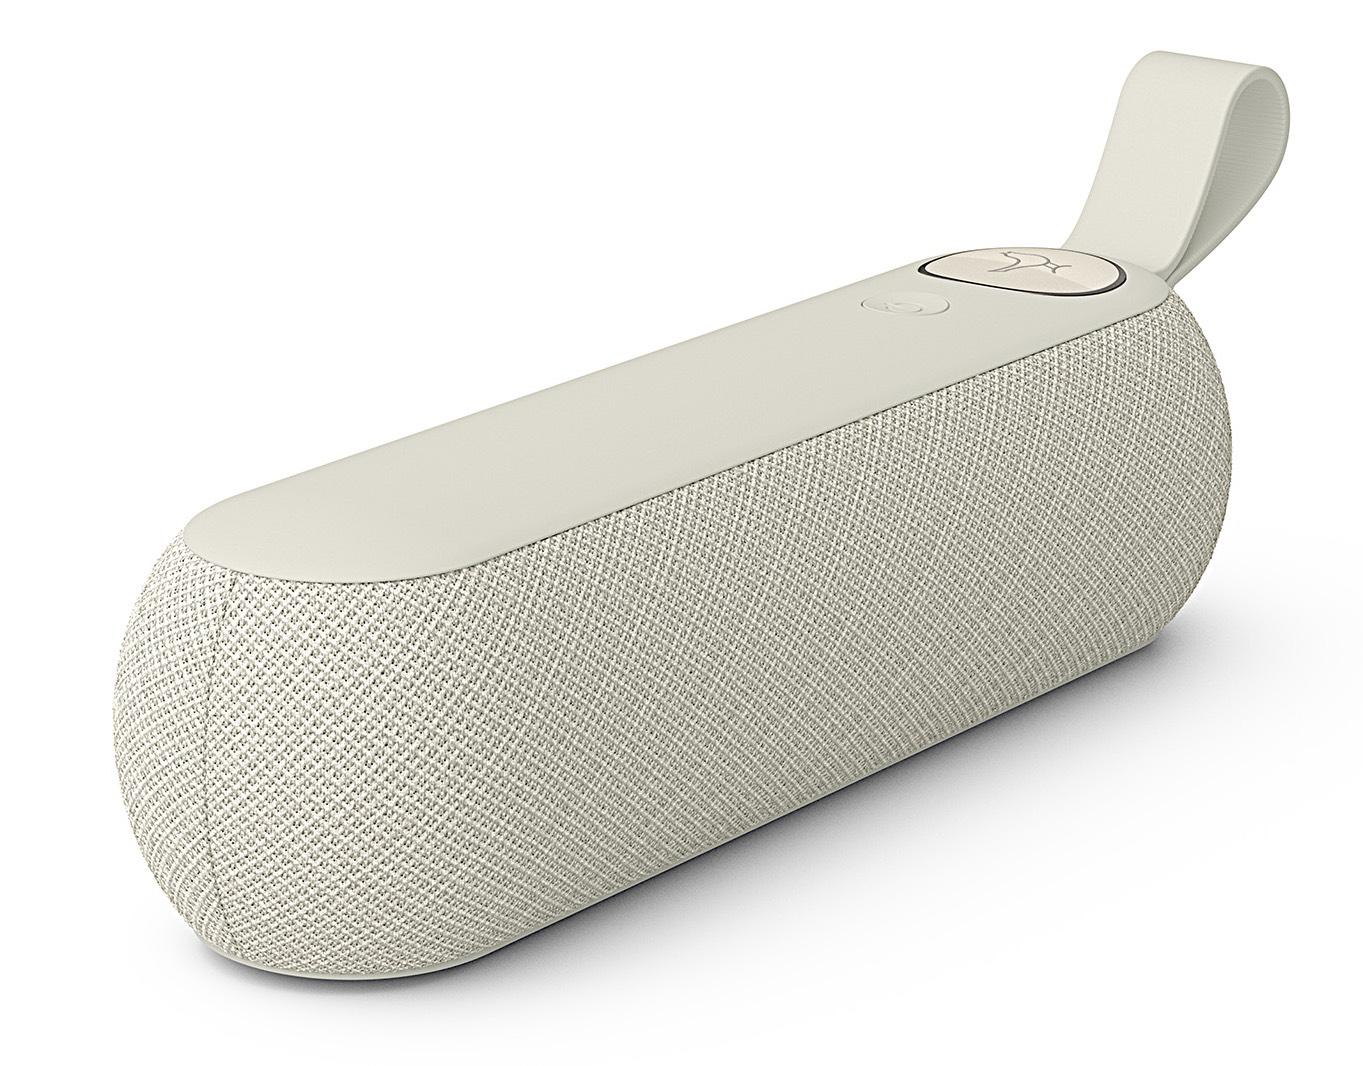 bluetooth lautsprecher one und too das libratone system. Black Bedroom Furniture Sets. Home Design Ideas